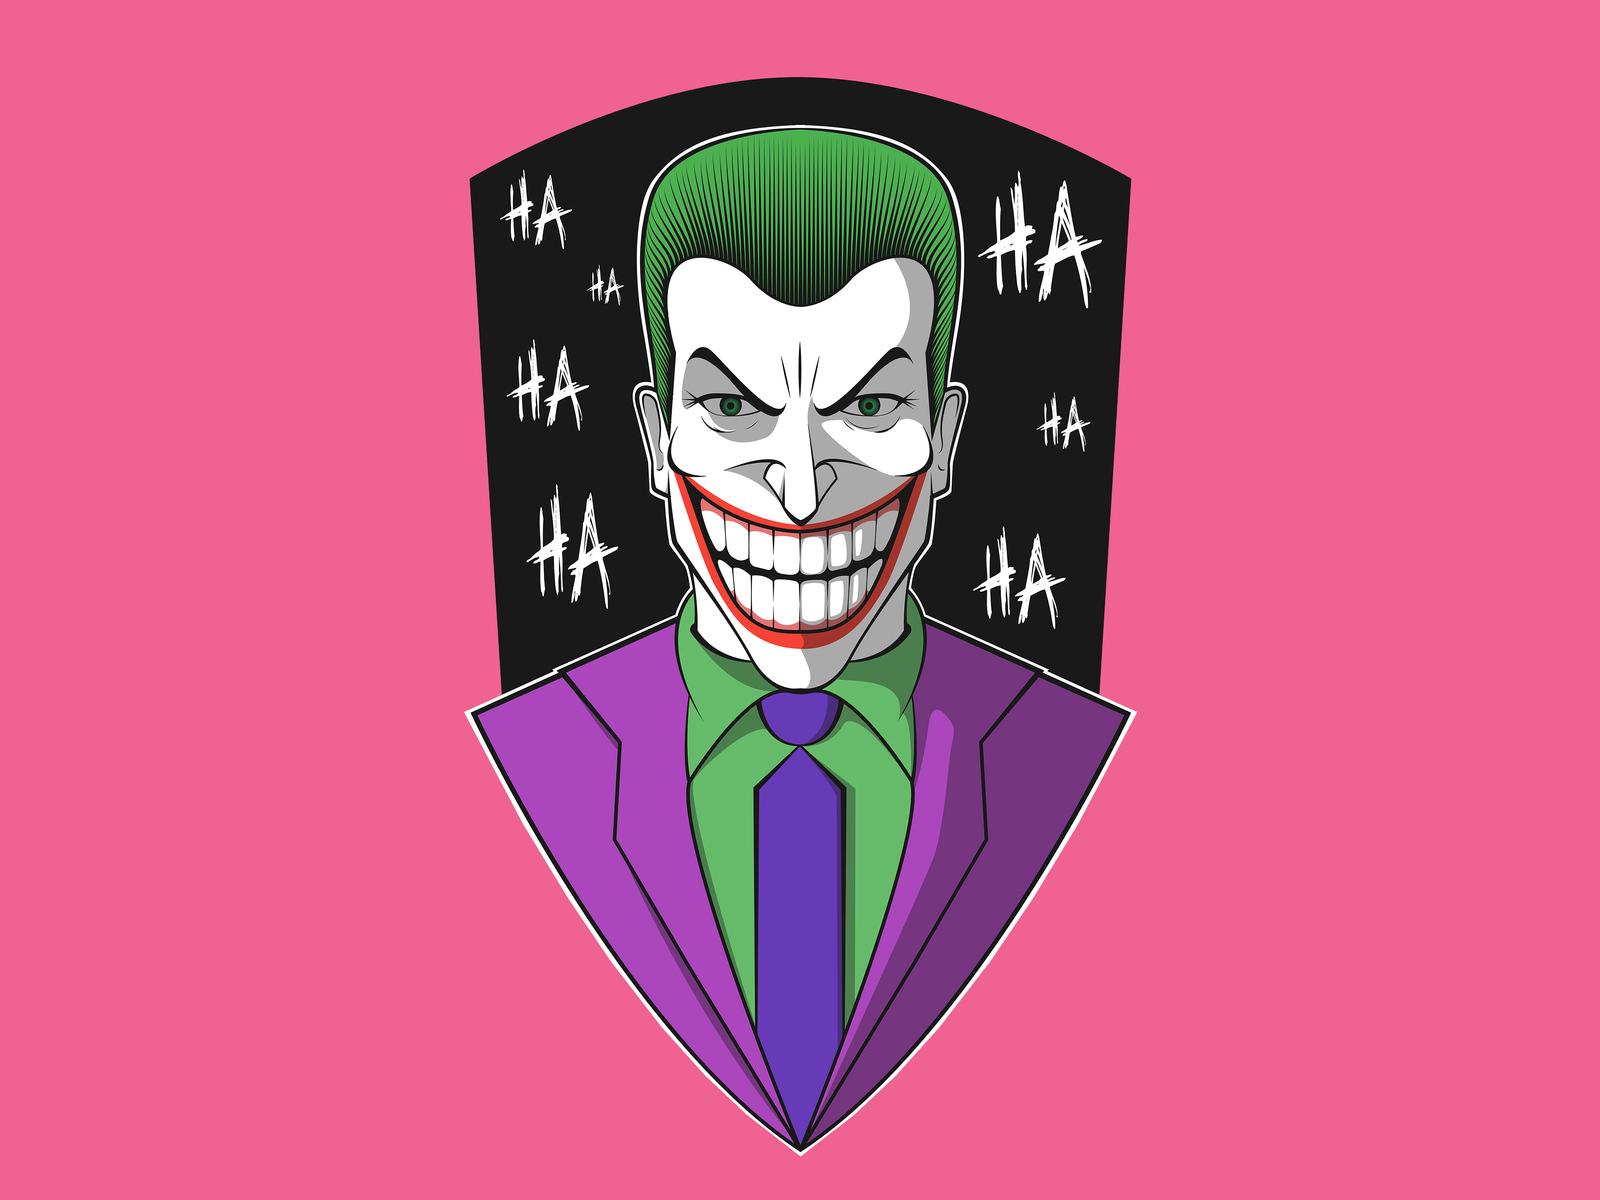 the-clown-prince-of-crime-i5.jpg